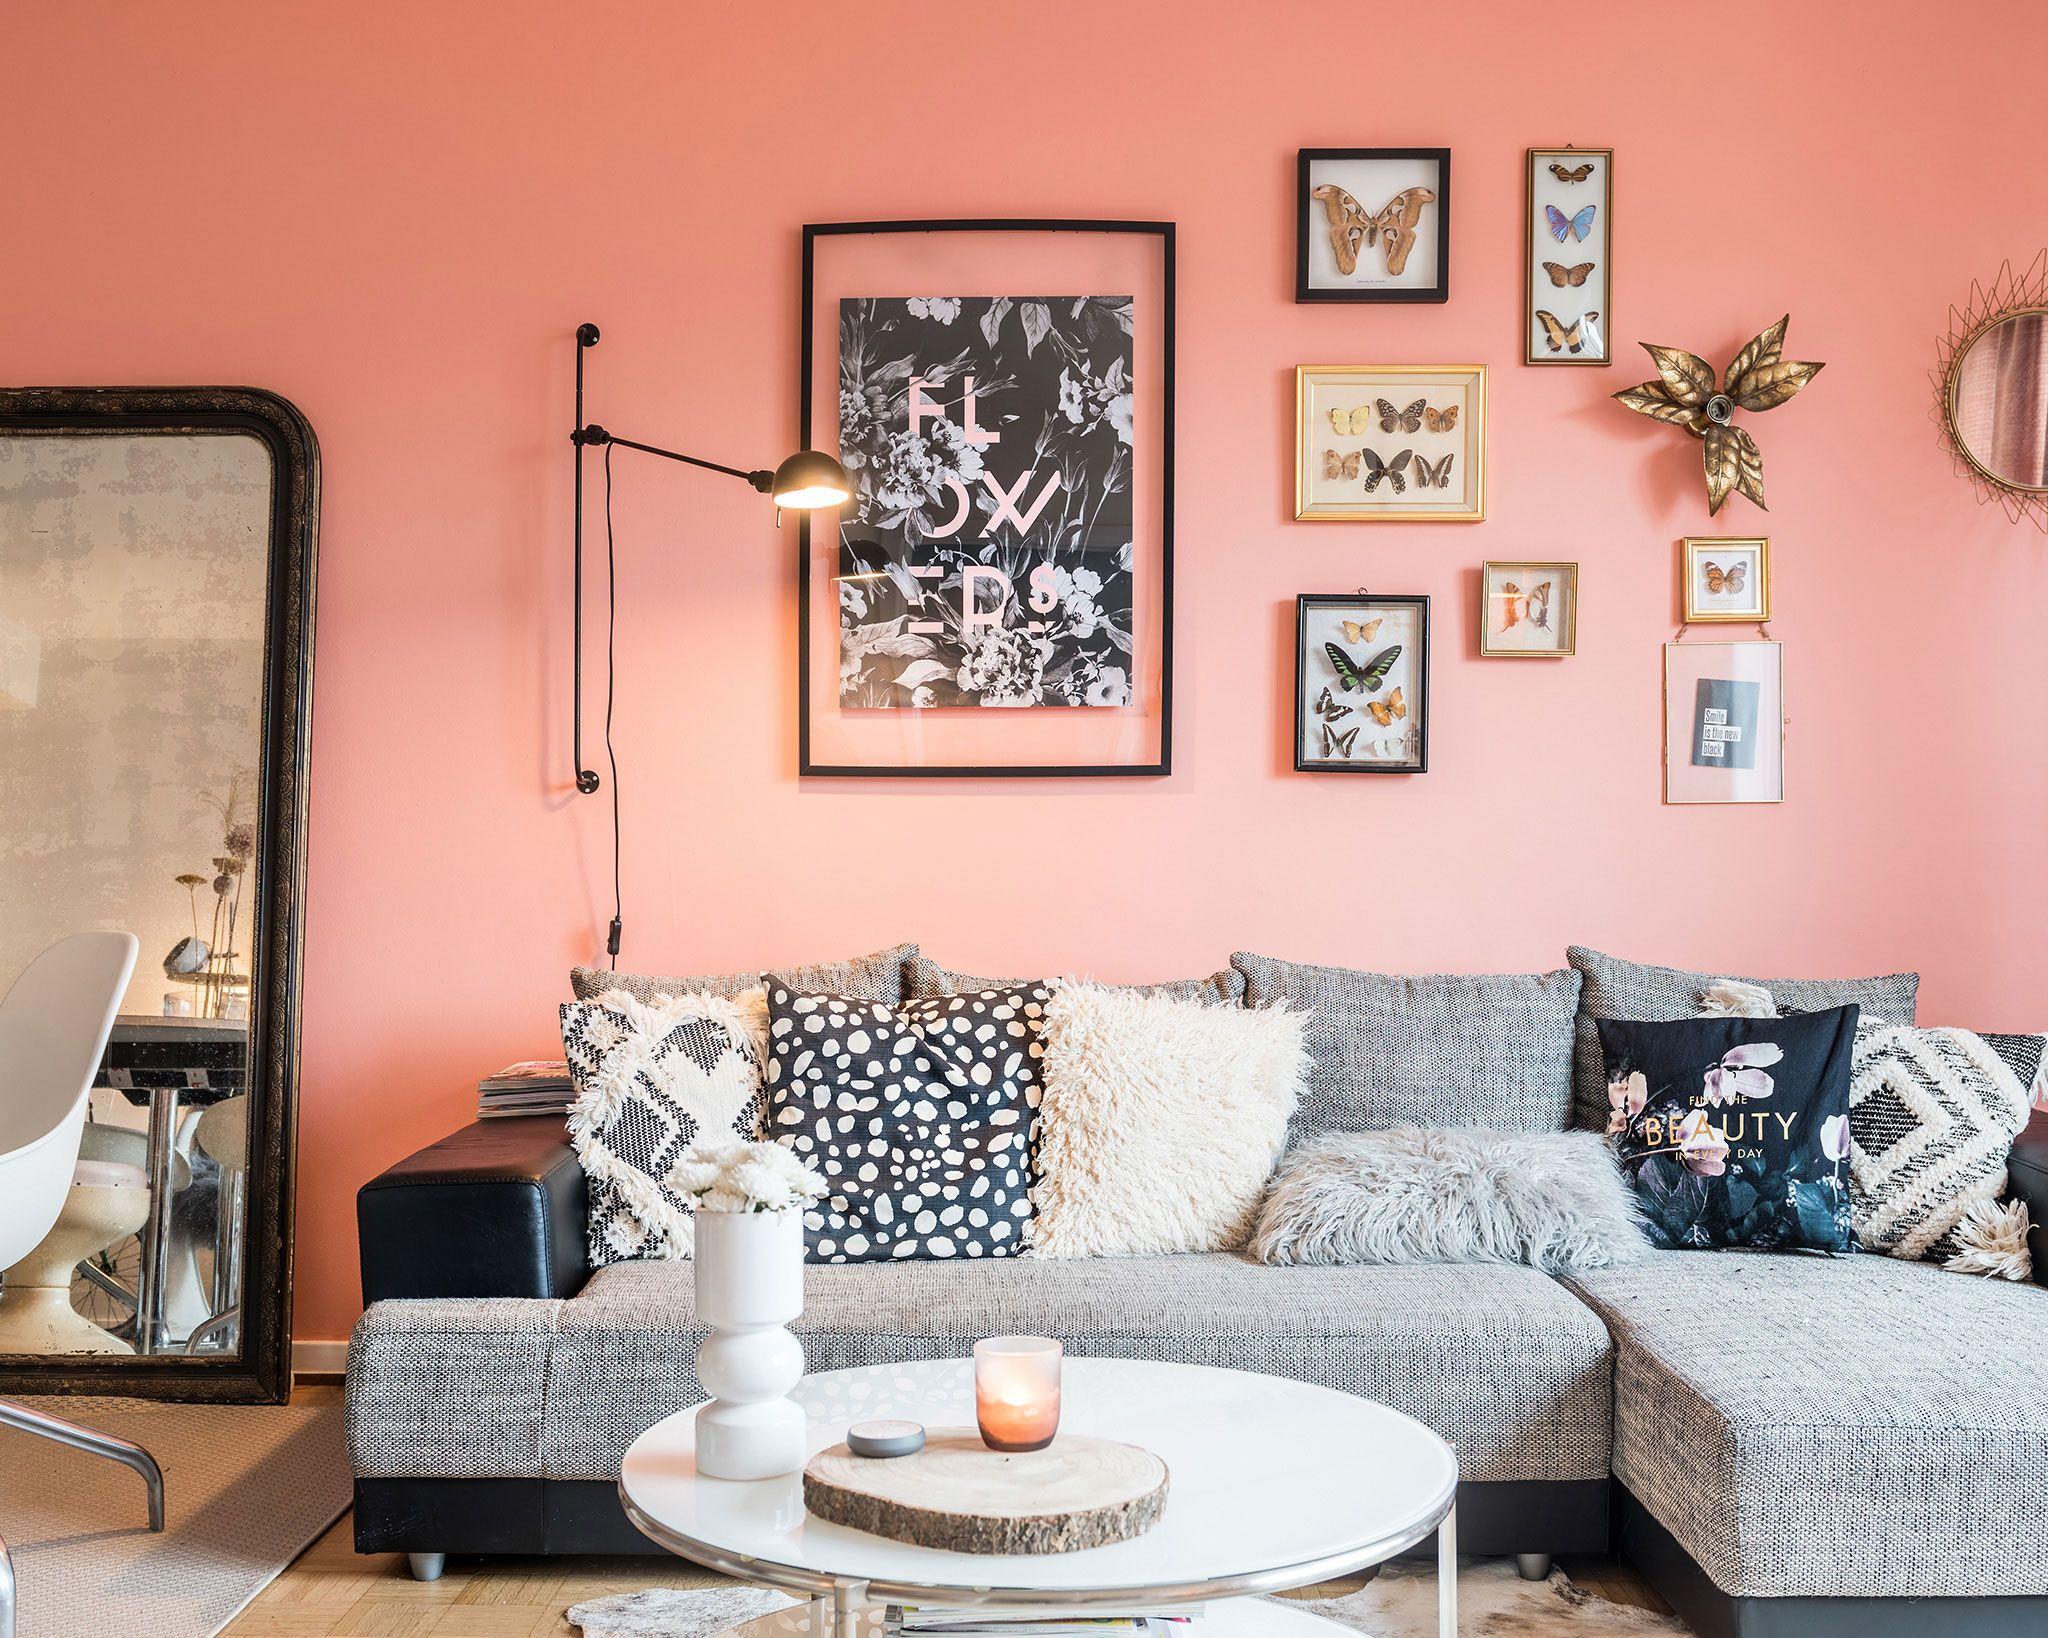 13zor Jennifer Ghislain woonkamer roze muur | Inspiratie woning ...